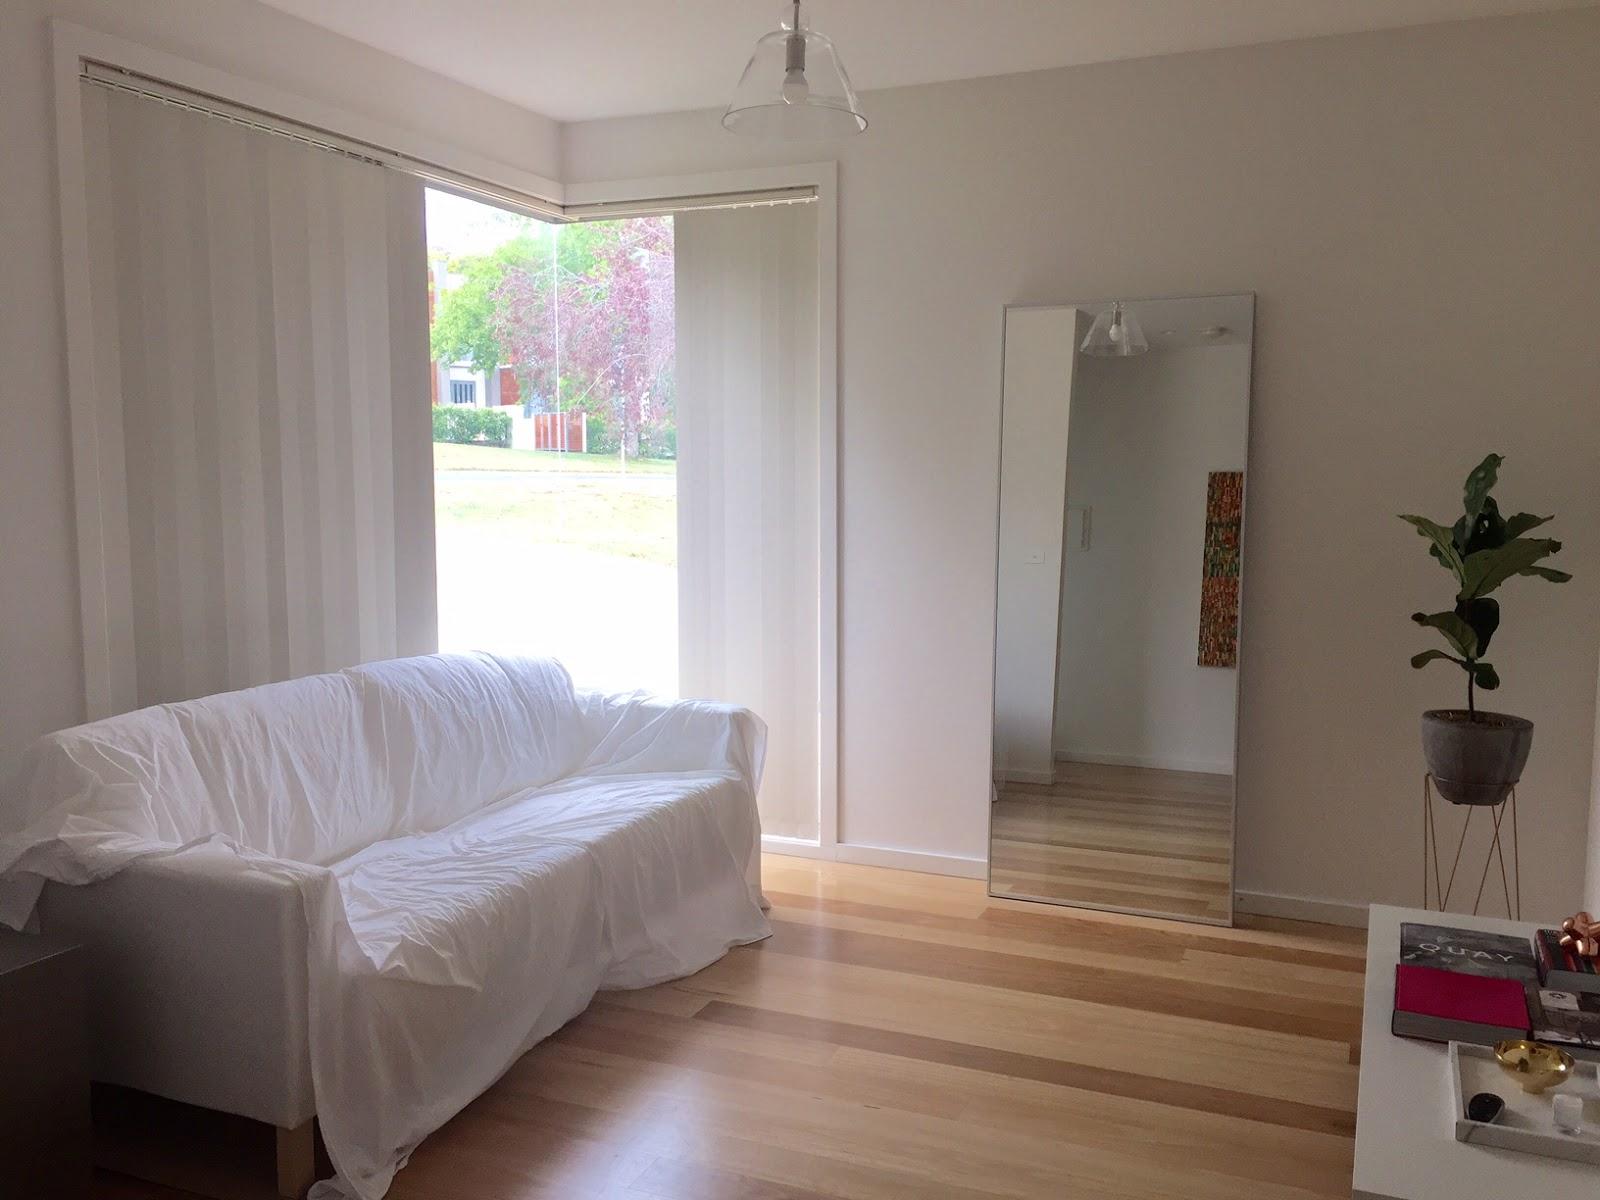 Karlstad Sofa Blekinge White Craigslist Tampa Bed Keeping Up In Canberra: Home - Front Living Room (part 2)